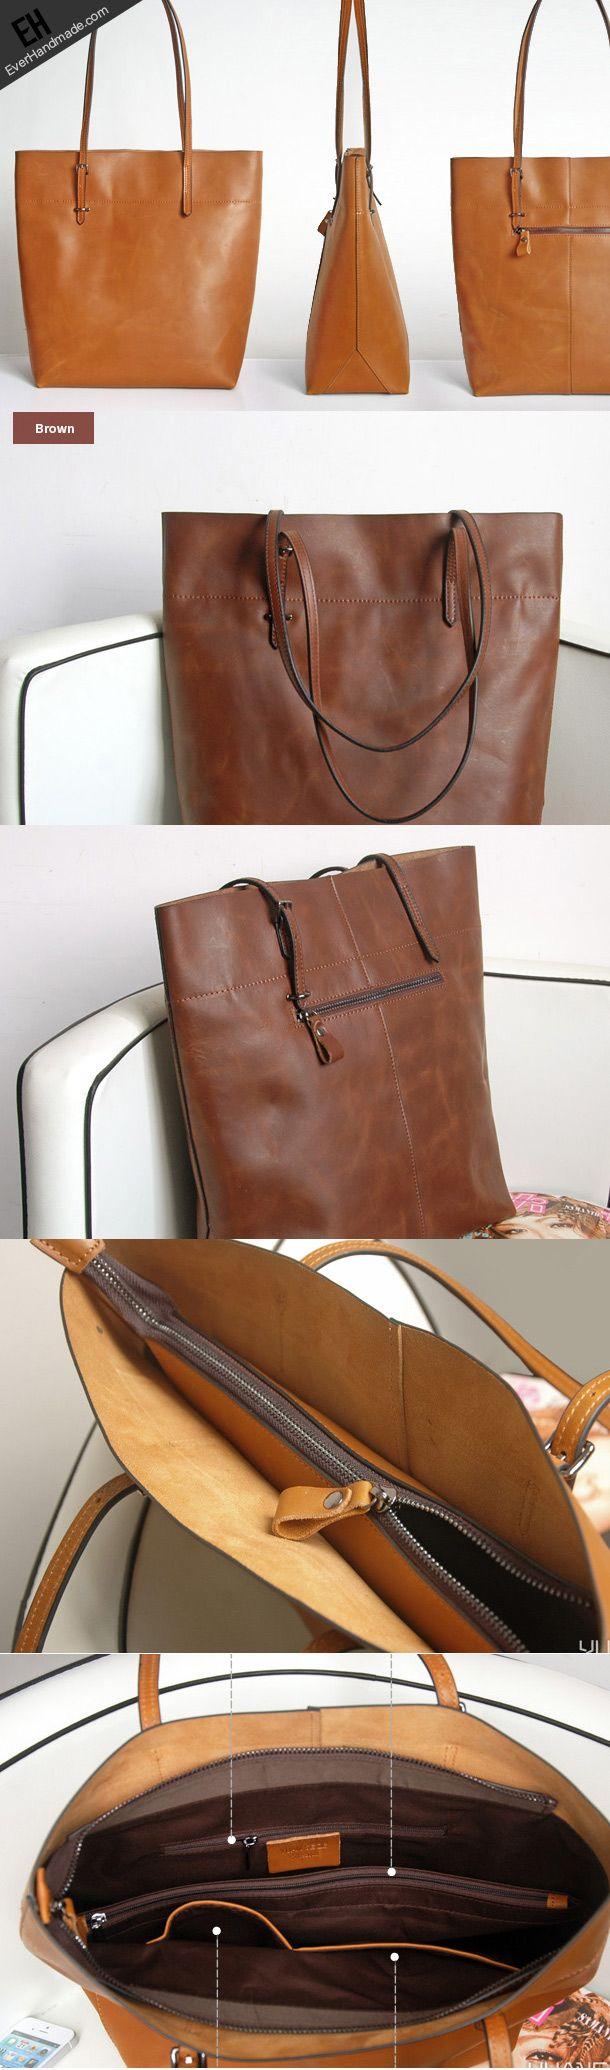 Handmade Leather Coffee Brown camel tote bag shopper bag for women leather shoulder bag